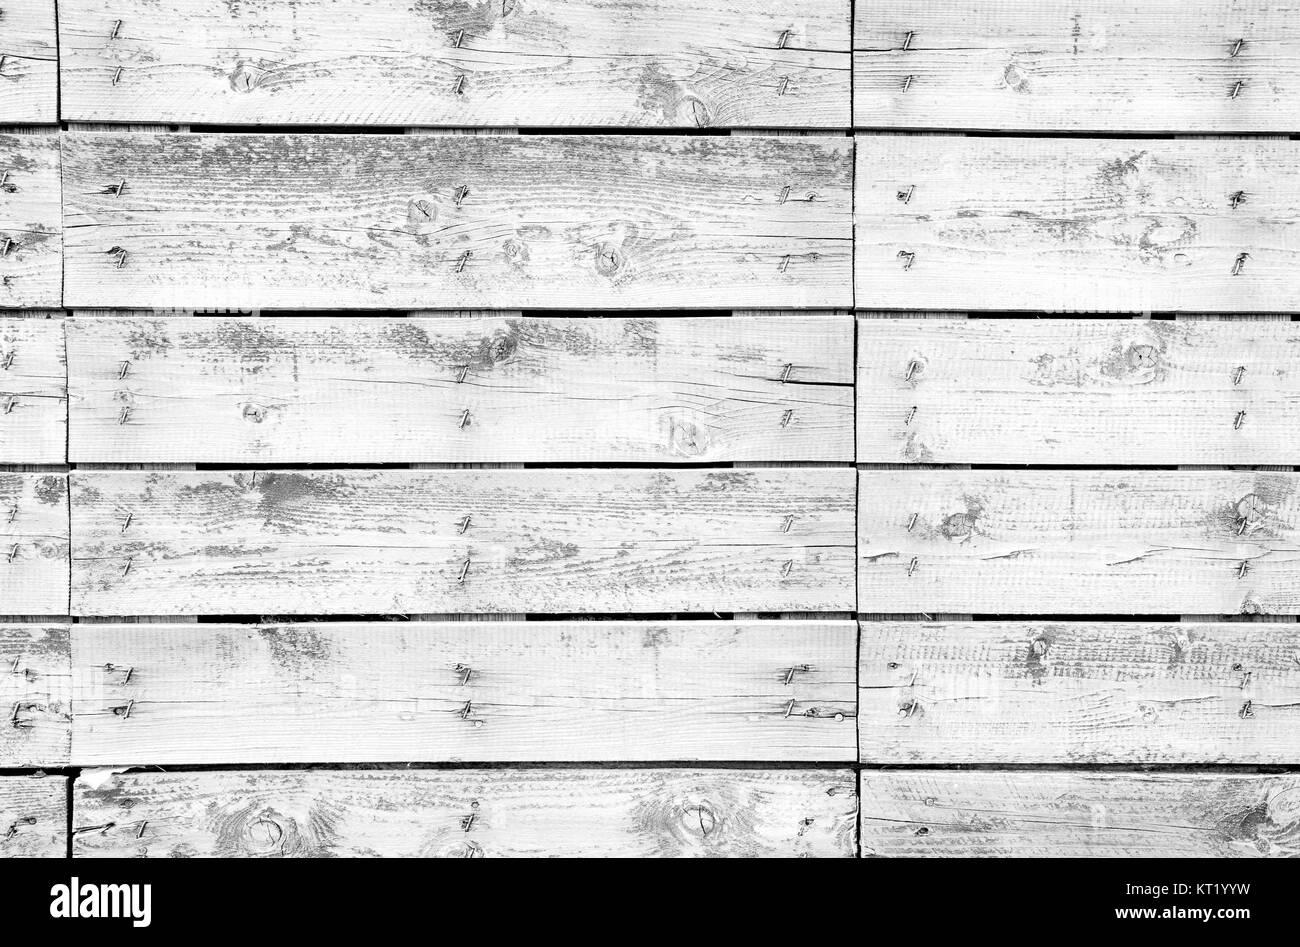 White wooden planks background - Stock Image